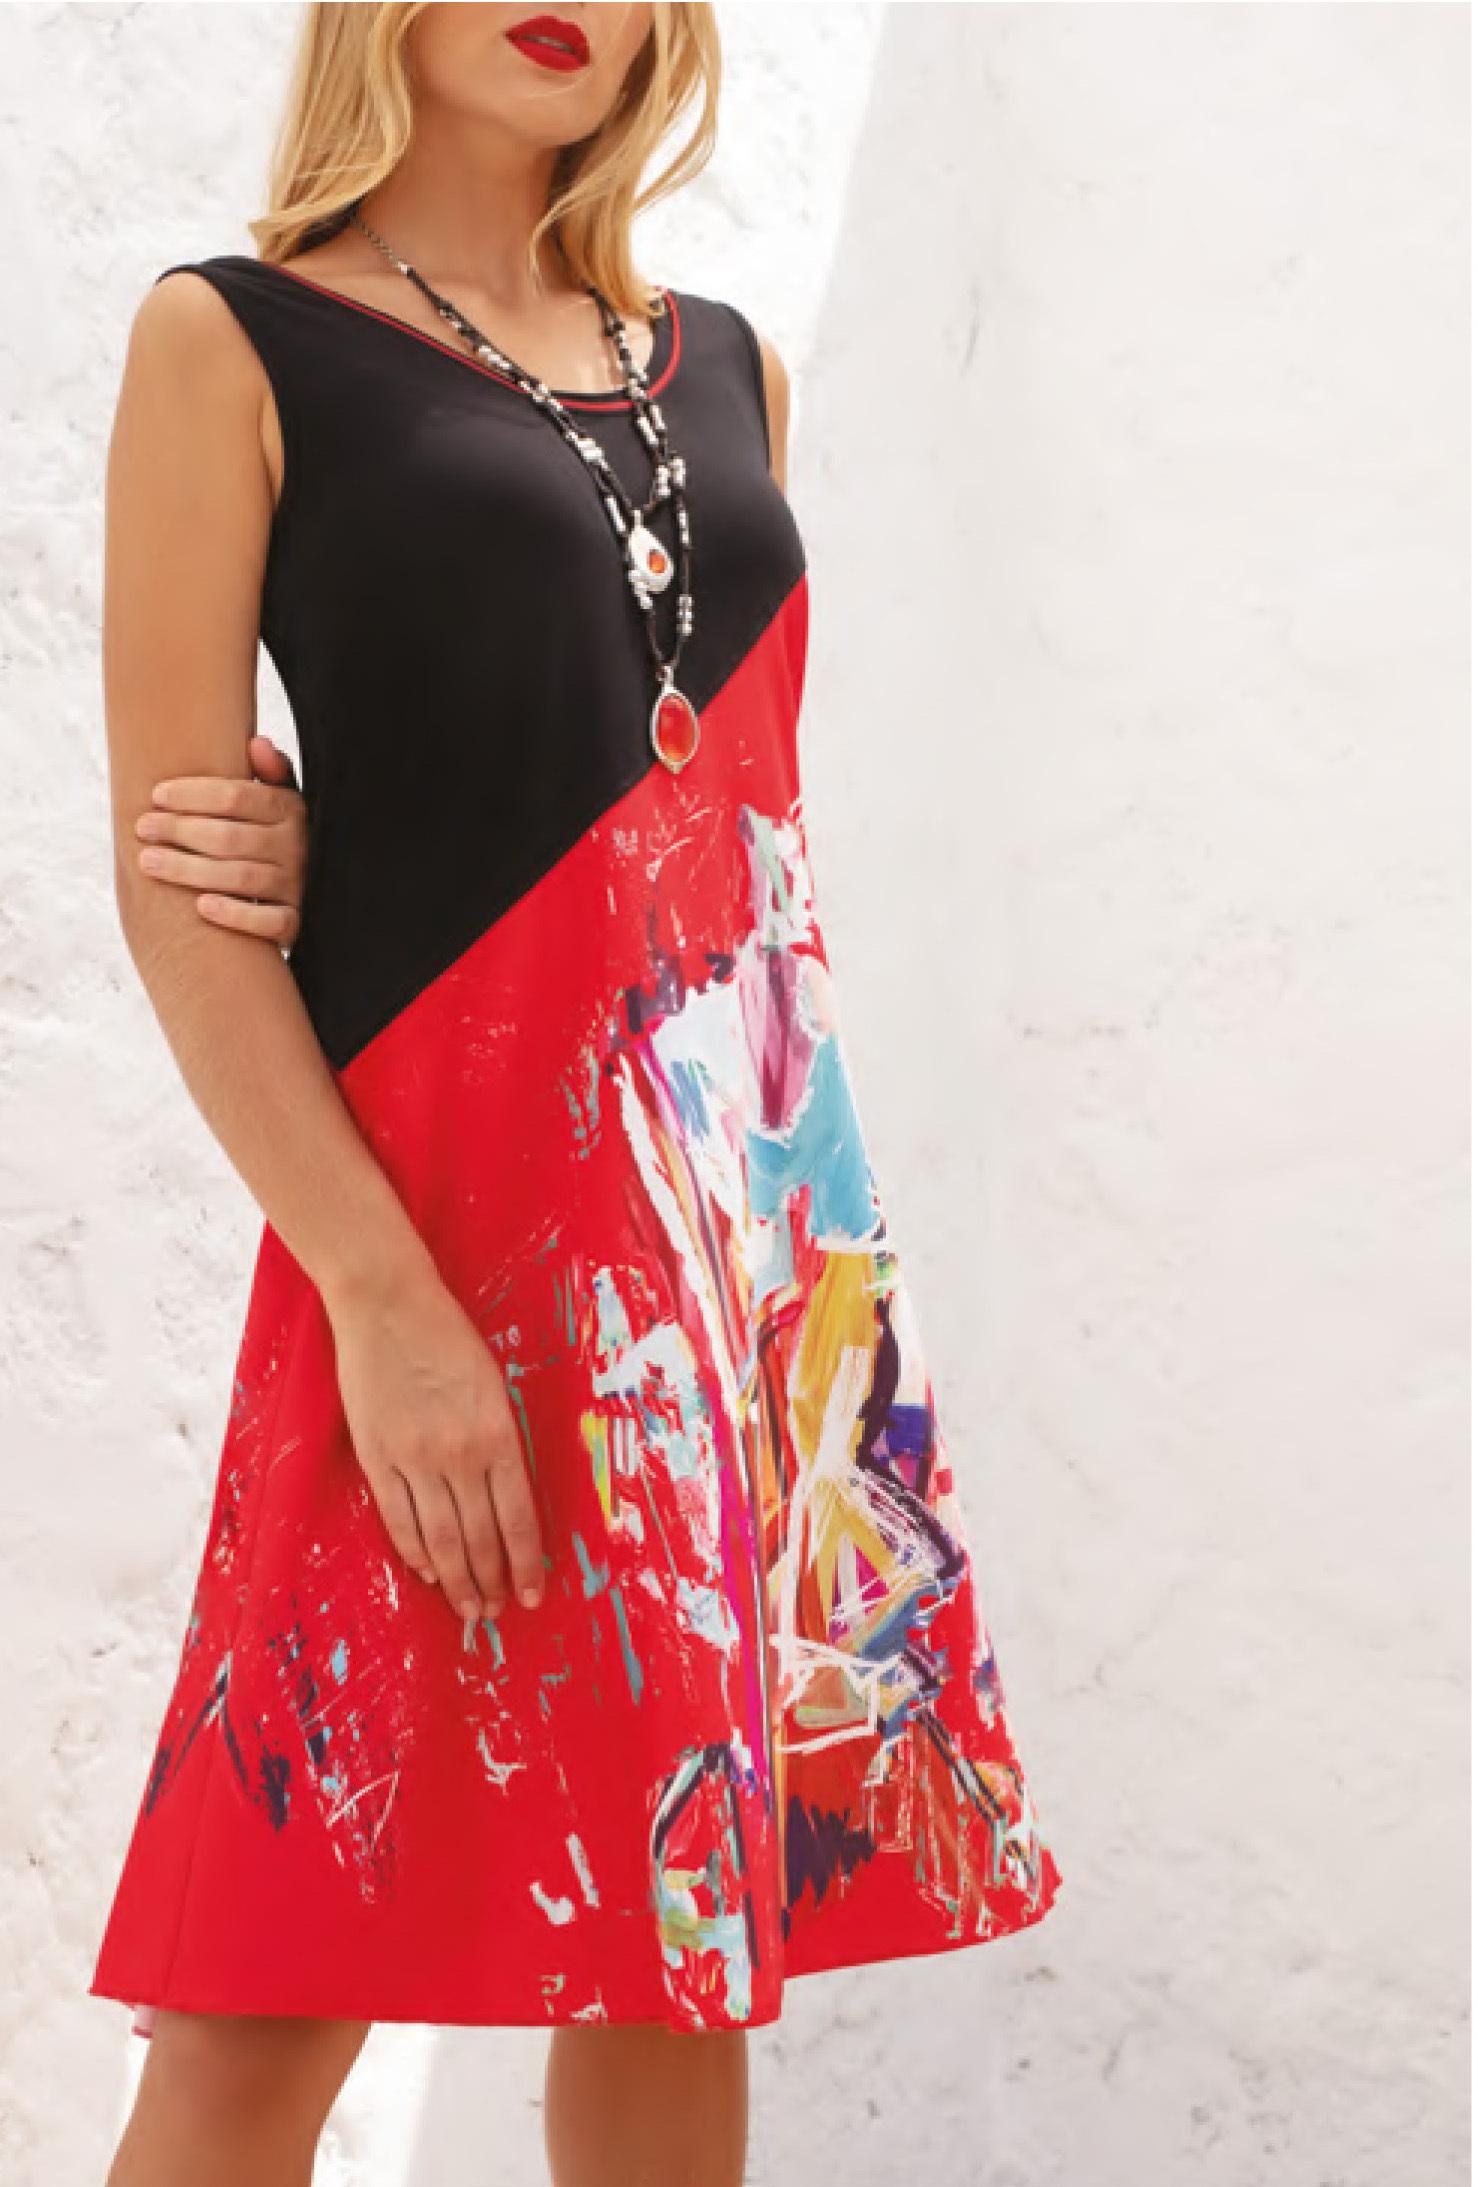 Maloka: Shimmering Colors Of MontMartre Contrast Art Dress (Few Left!) MK_NALANI